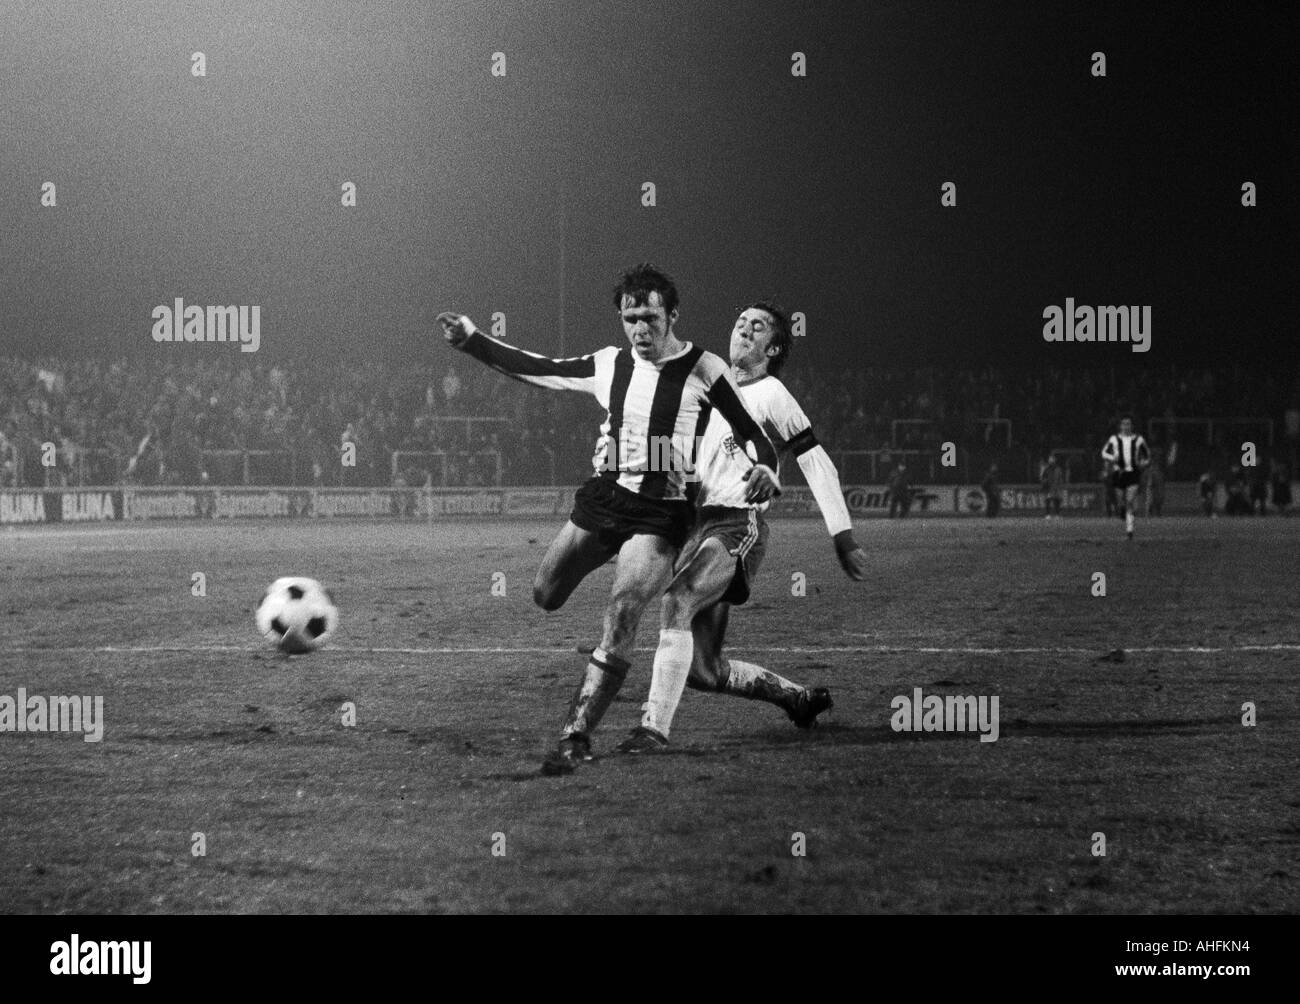 football, Bundesliga, 1971/1972, Rot-Weiss Oberhausen versus 1. FC Kaiserslautern 2:5, Niederrhein Stadium in Oberhausen, scene of the match, duel between Wolfgang Seel (FCK) left and Werner Ohm (RWO) - Stock Image